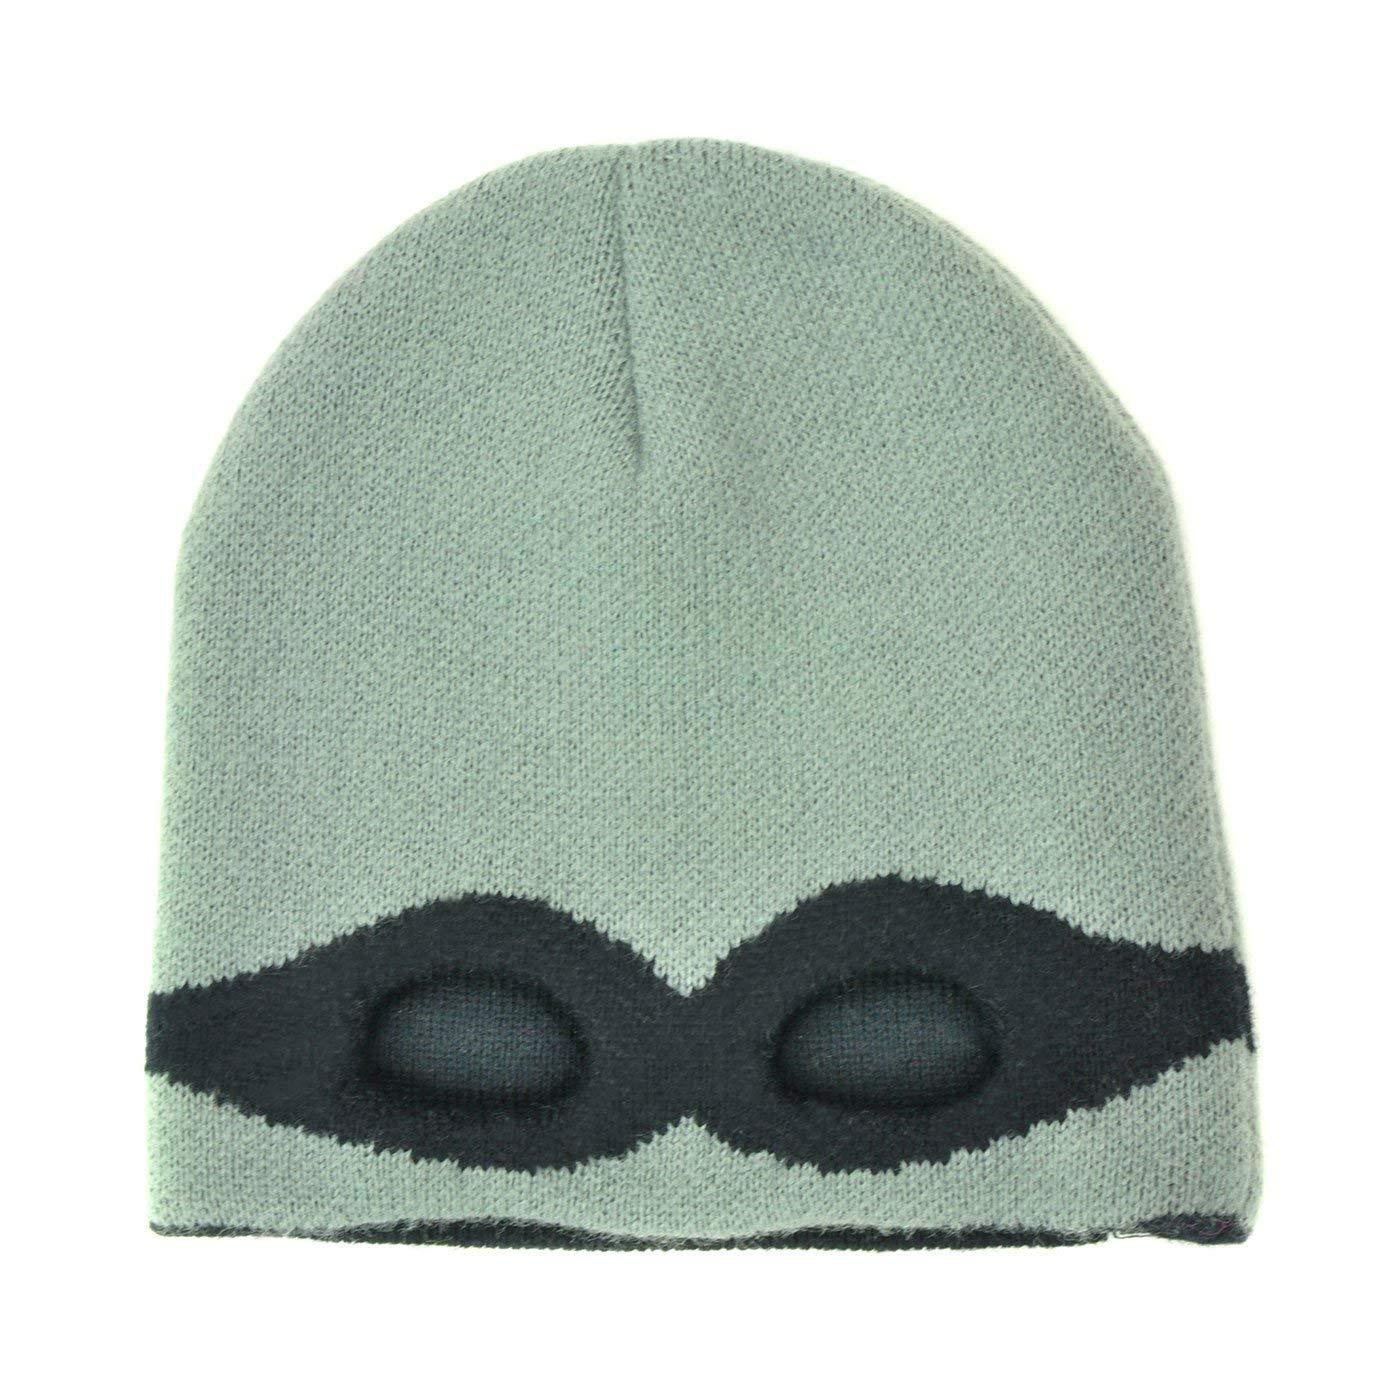 0fe072dddee Amazon.com  Neon Eaters Boys Knit Bandit Mask Beanie - Warm Kids ski  Snowboard Winter Fun Cute Christmas  Clothing